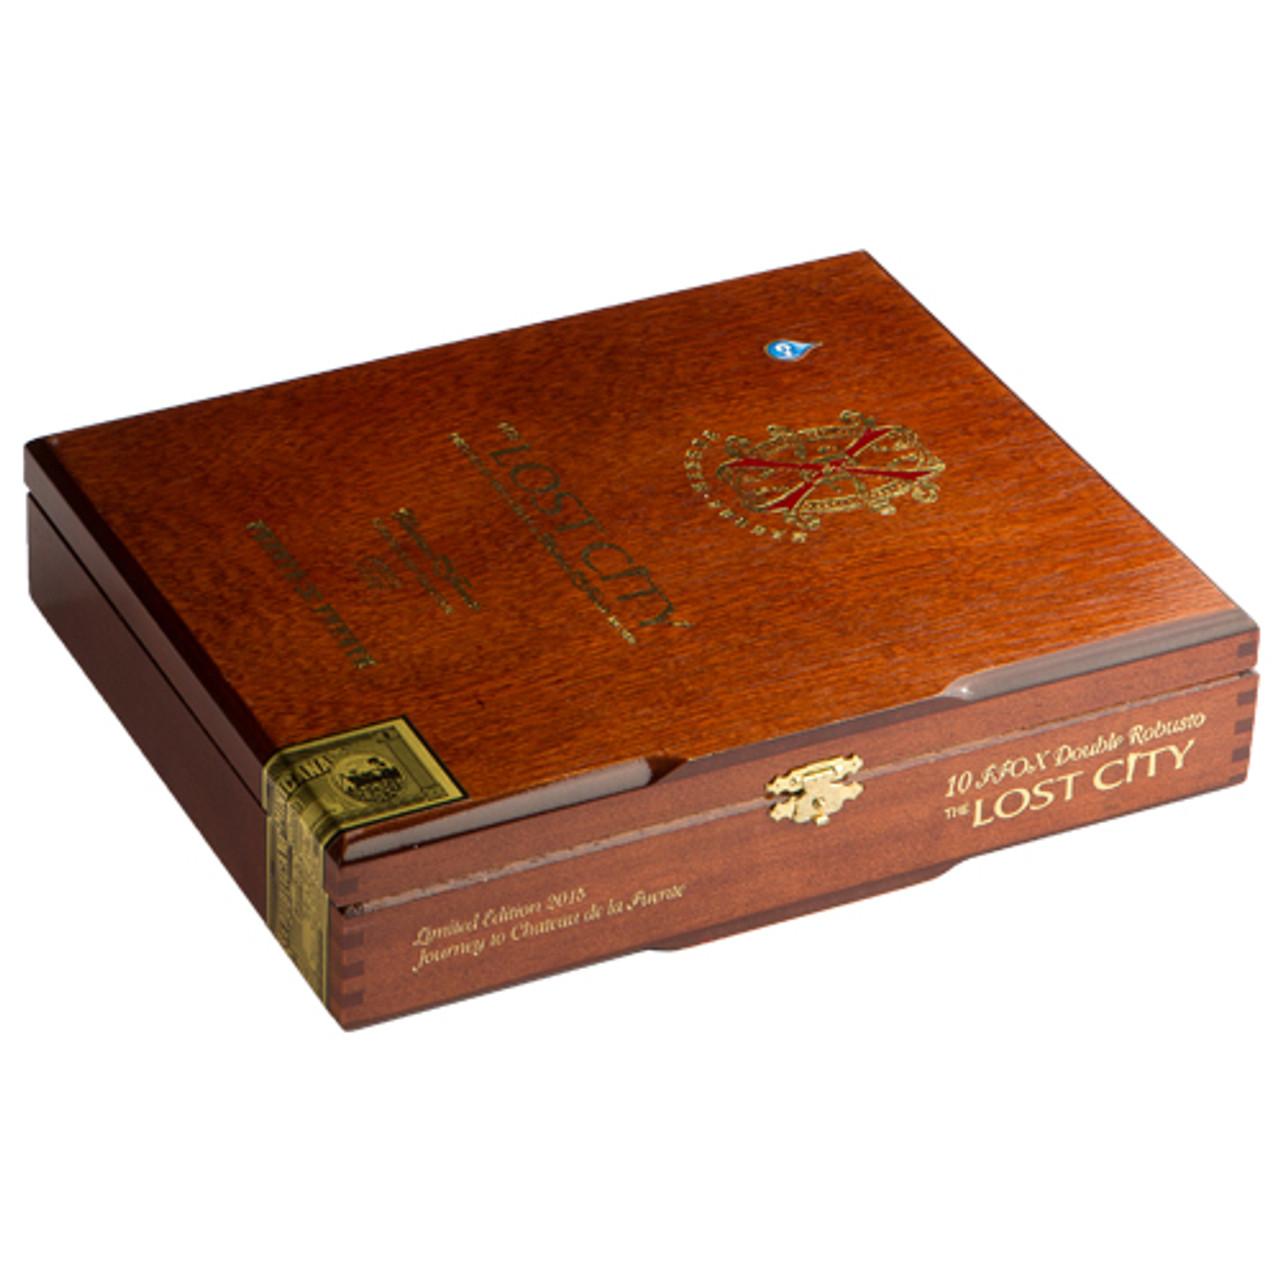 Fuente Fuente Opus X The Lost City Toro Cigars - 6.75 x 48 (Box of 10)